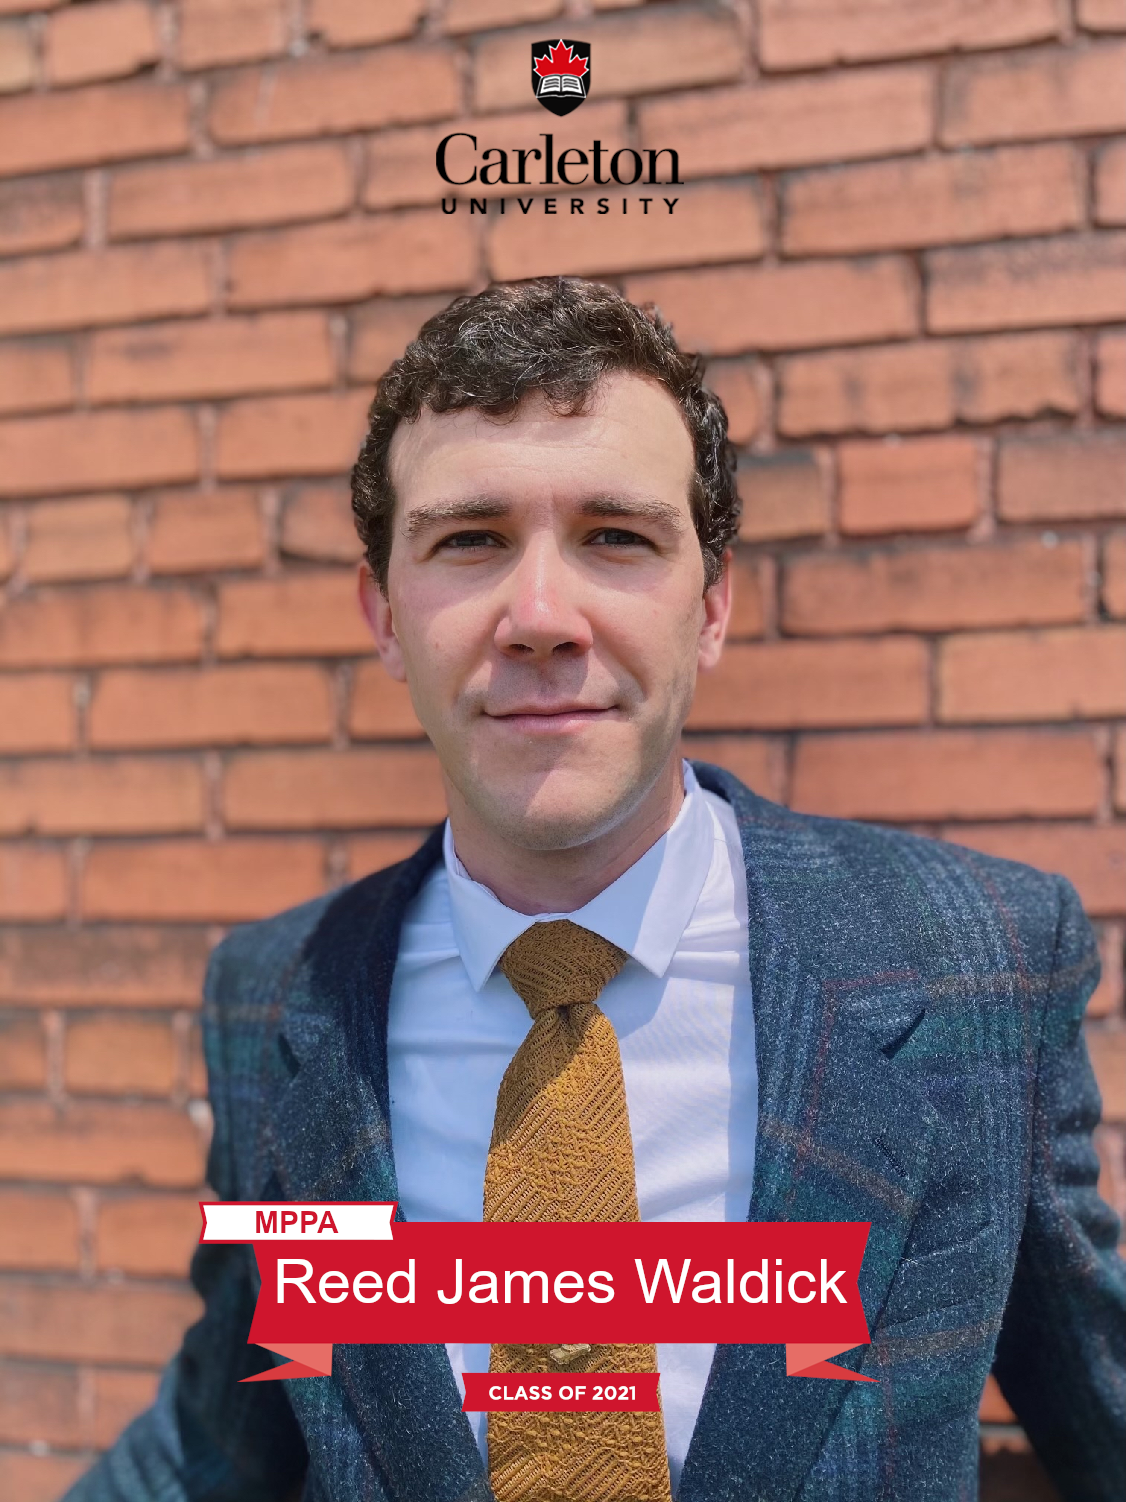 Reed James Waldick. MPPA graduate, class of 2021